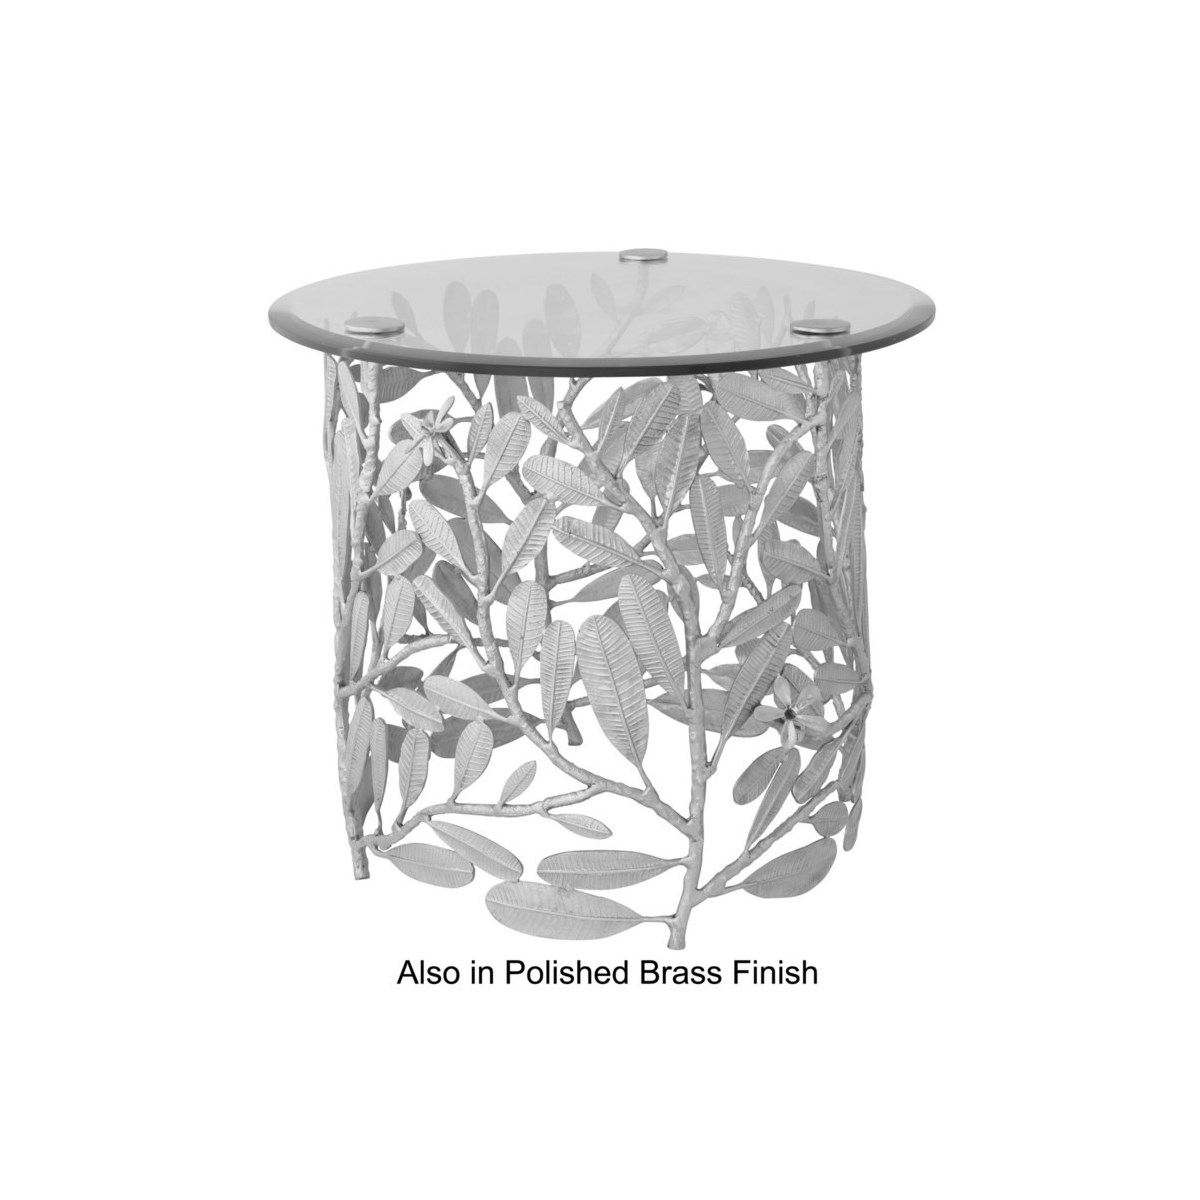 Asana Table - Burnished Brass